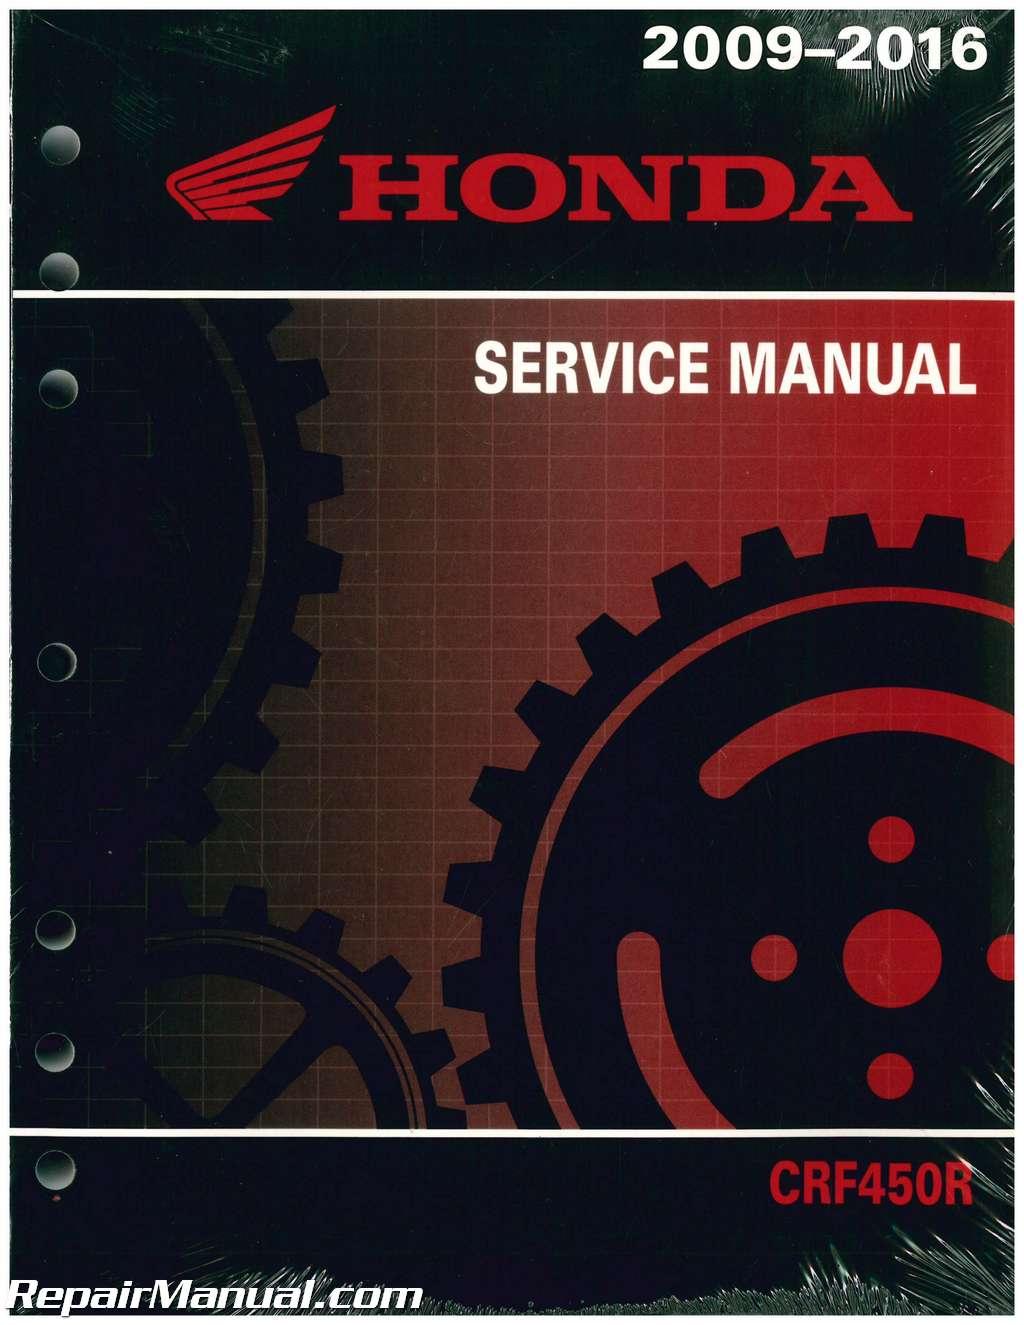 2018 Crf450r Service Manual Pdf Free